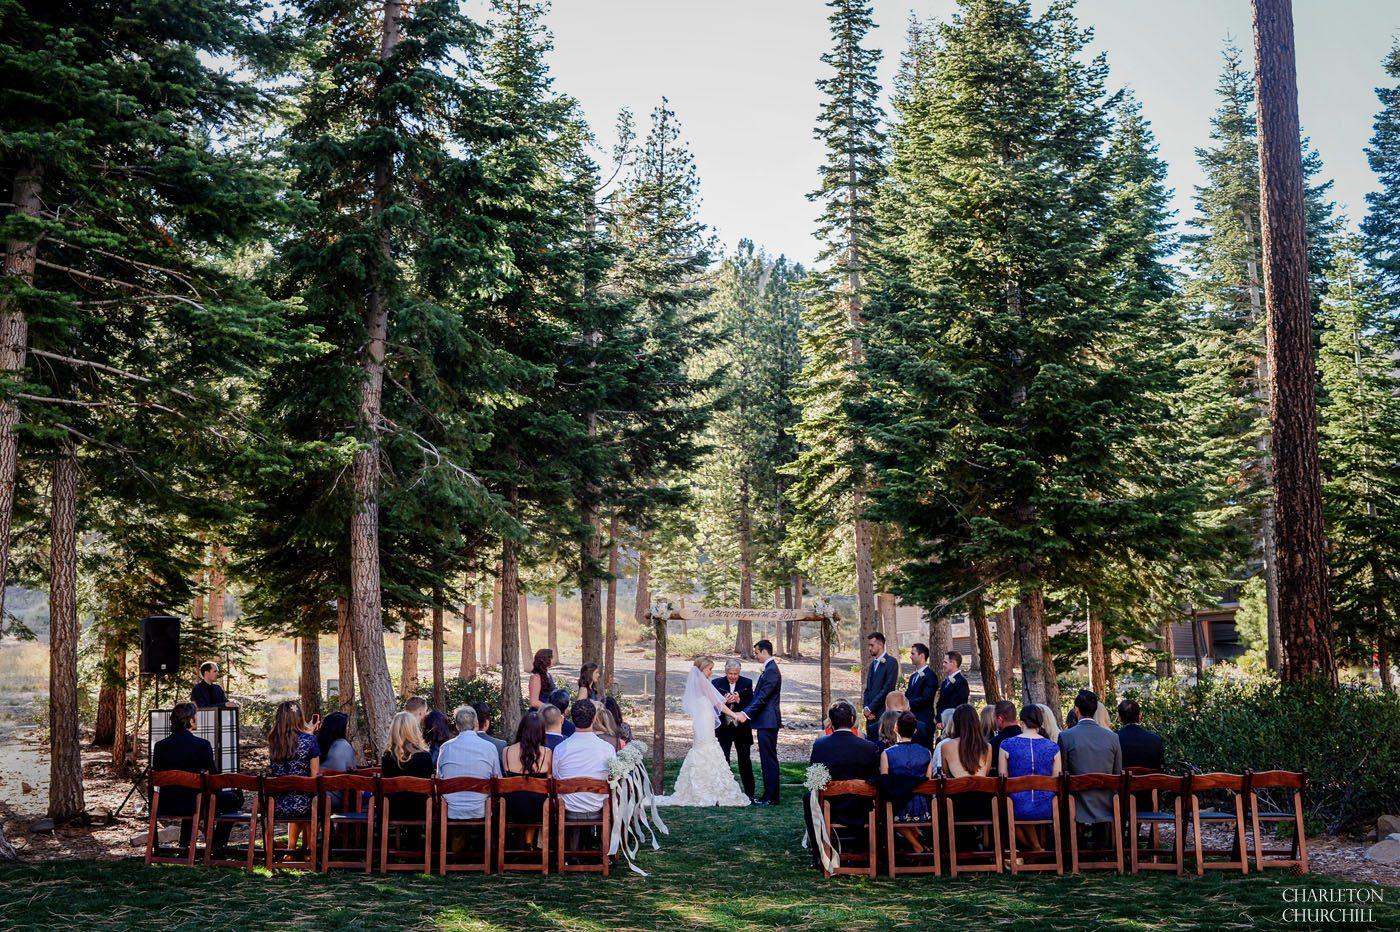 wedding ceremony at ritz carlton tahoe in truckee, ca